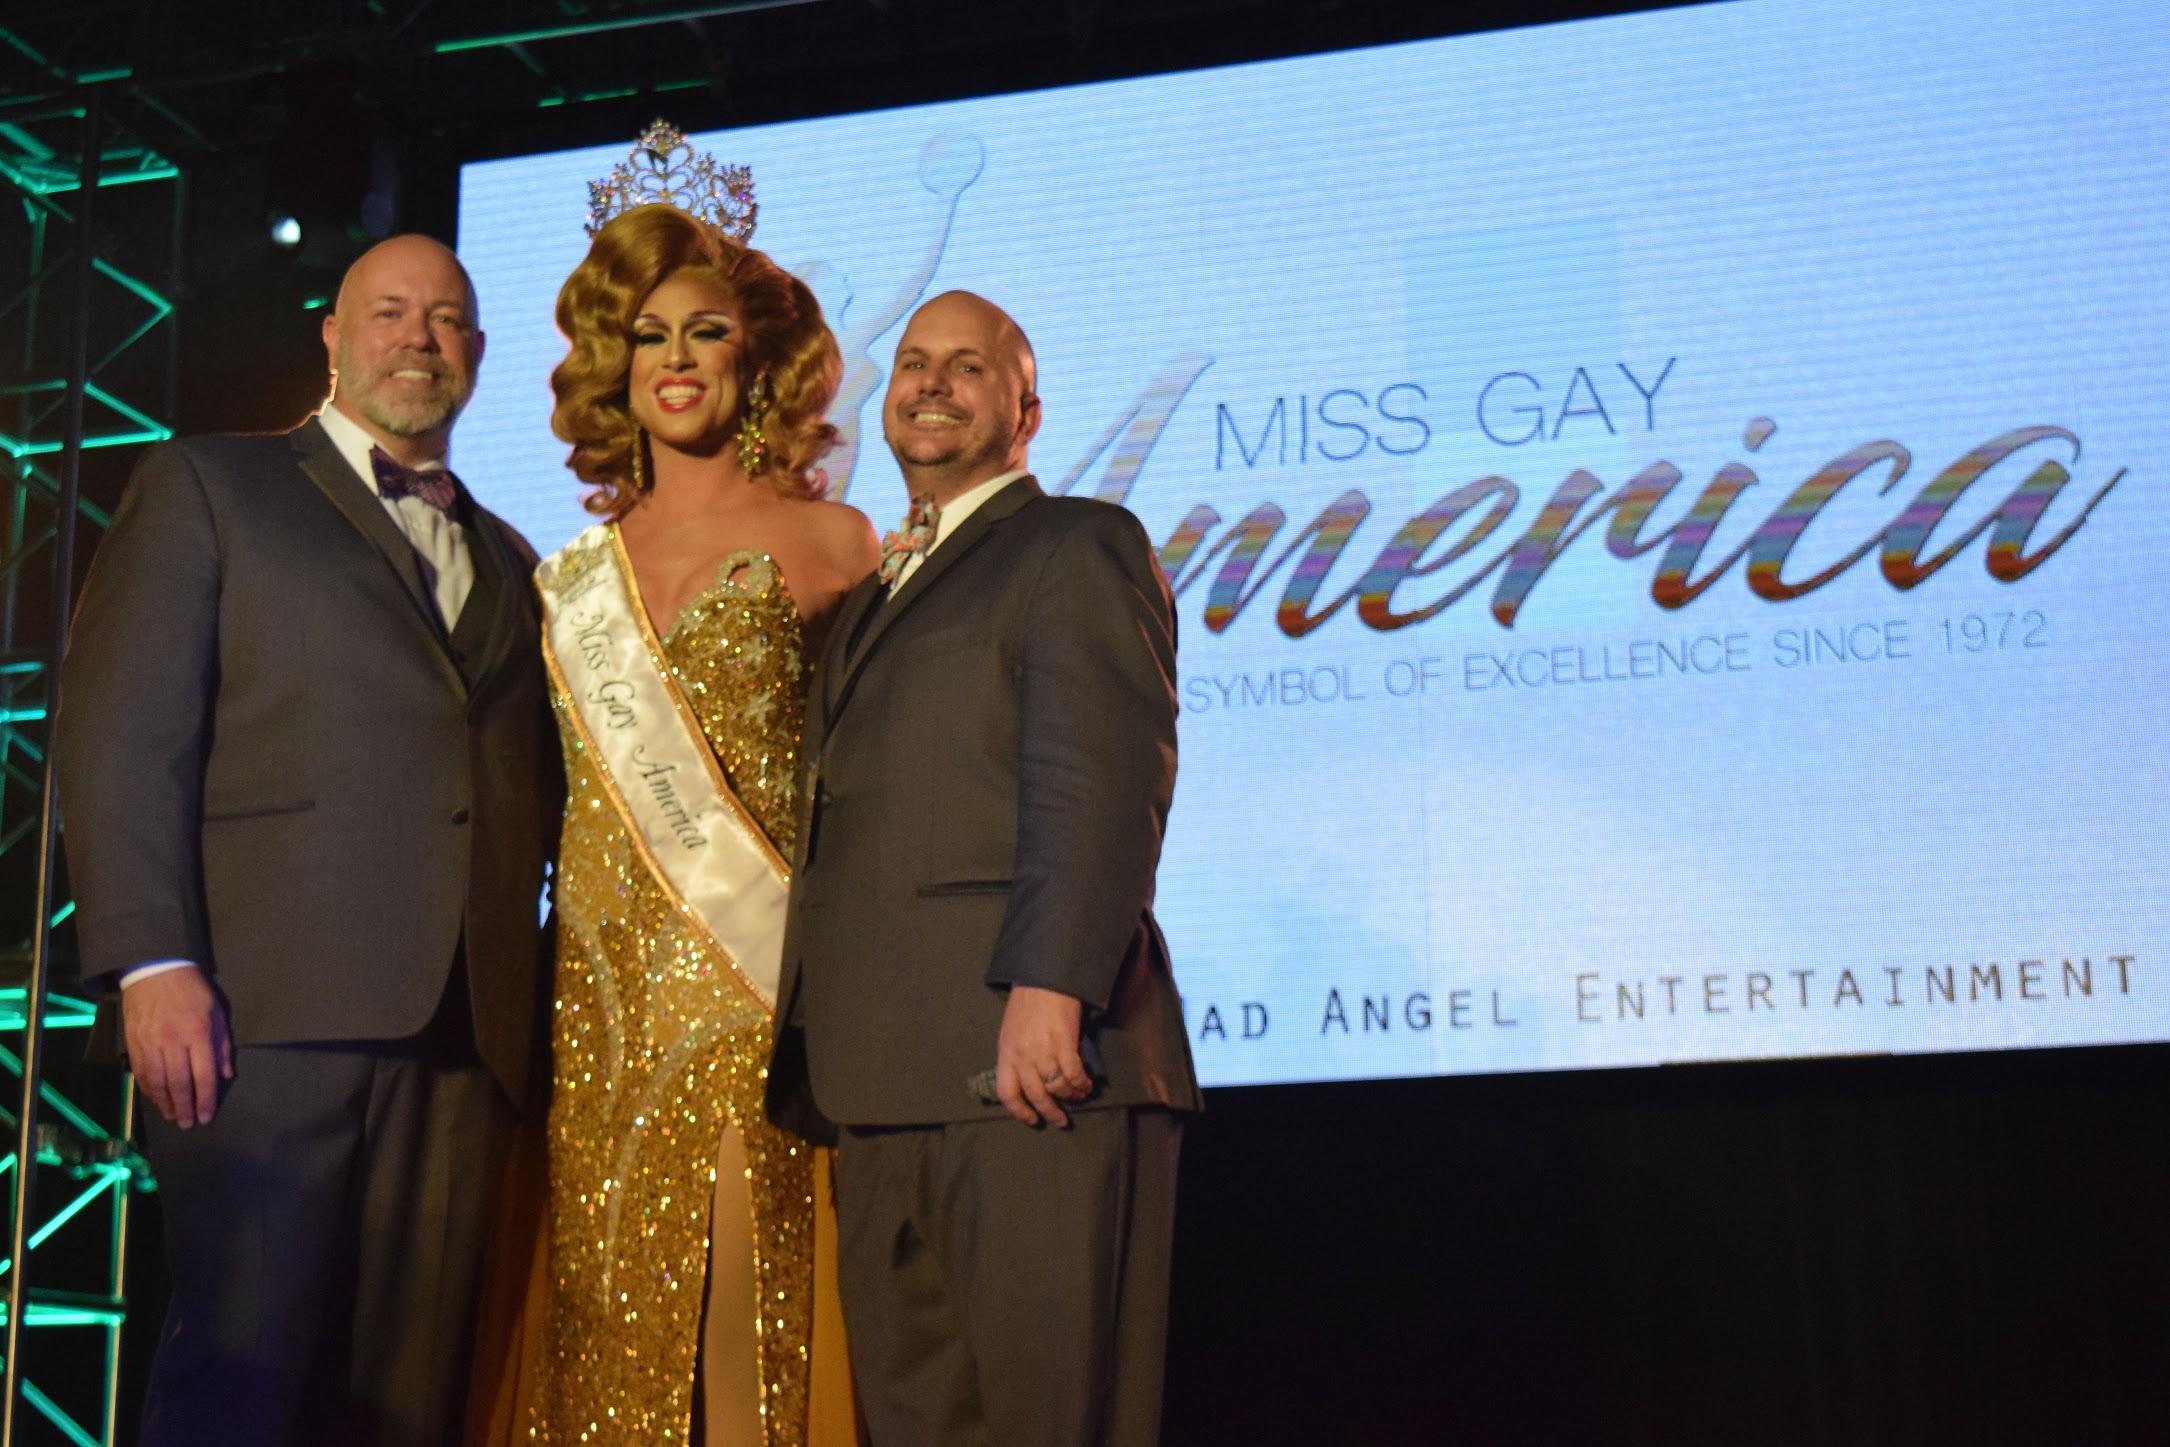 miss gay america 2